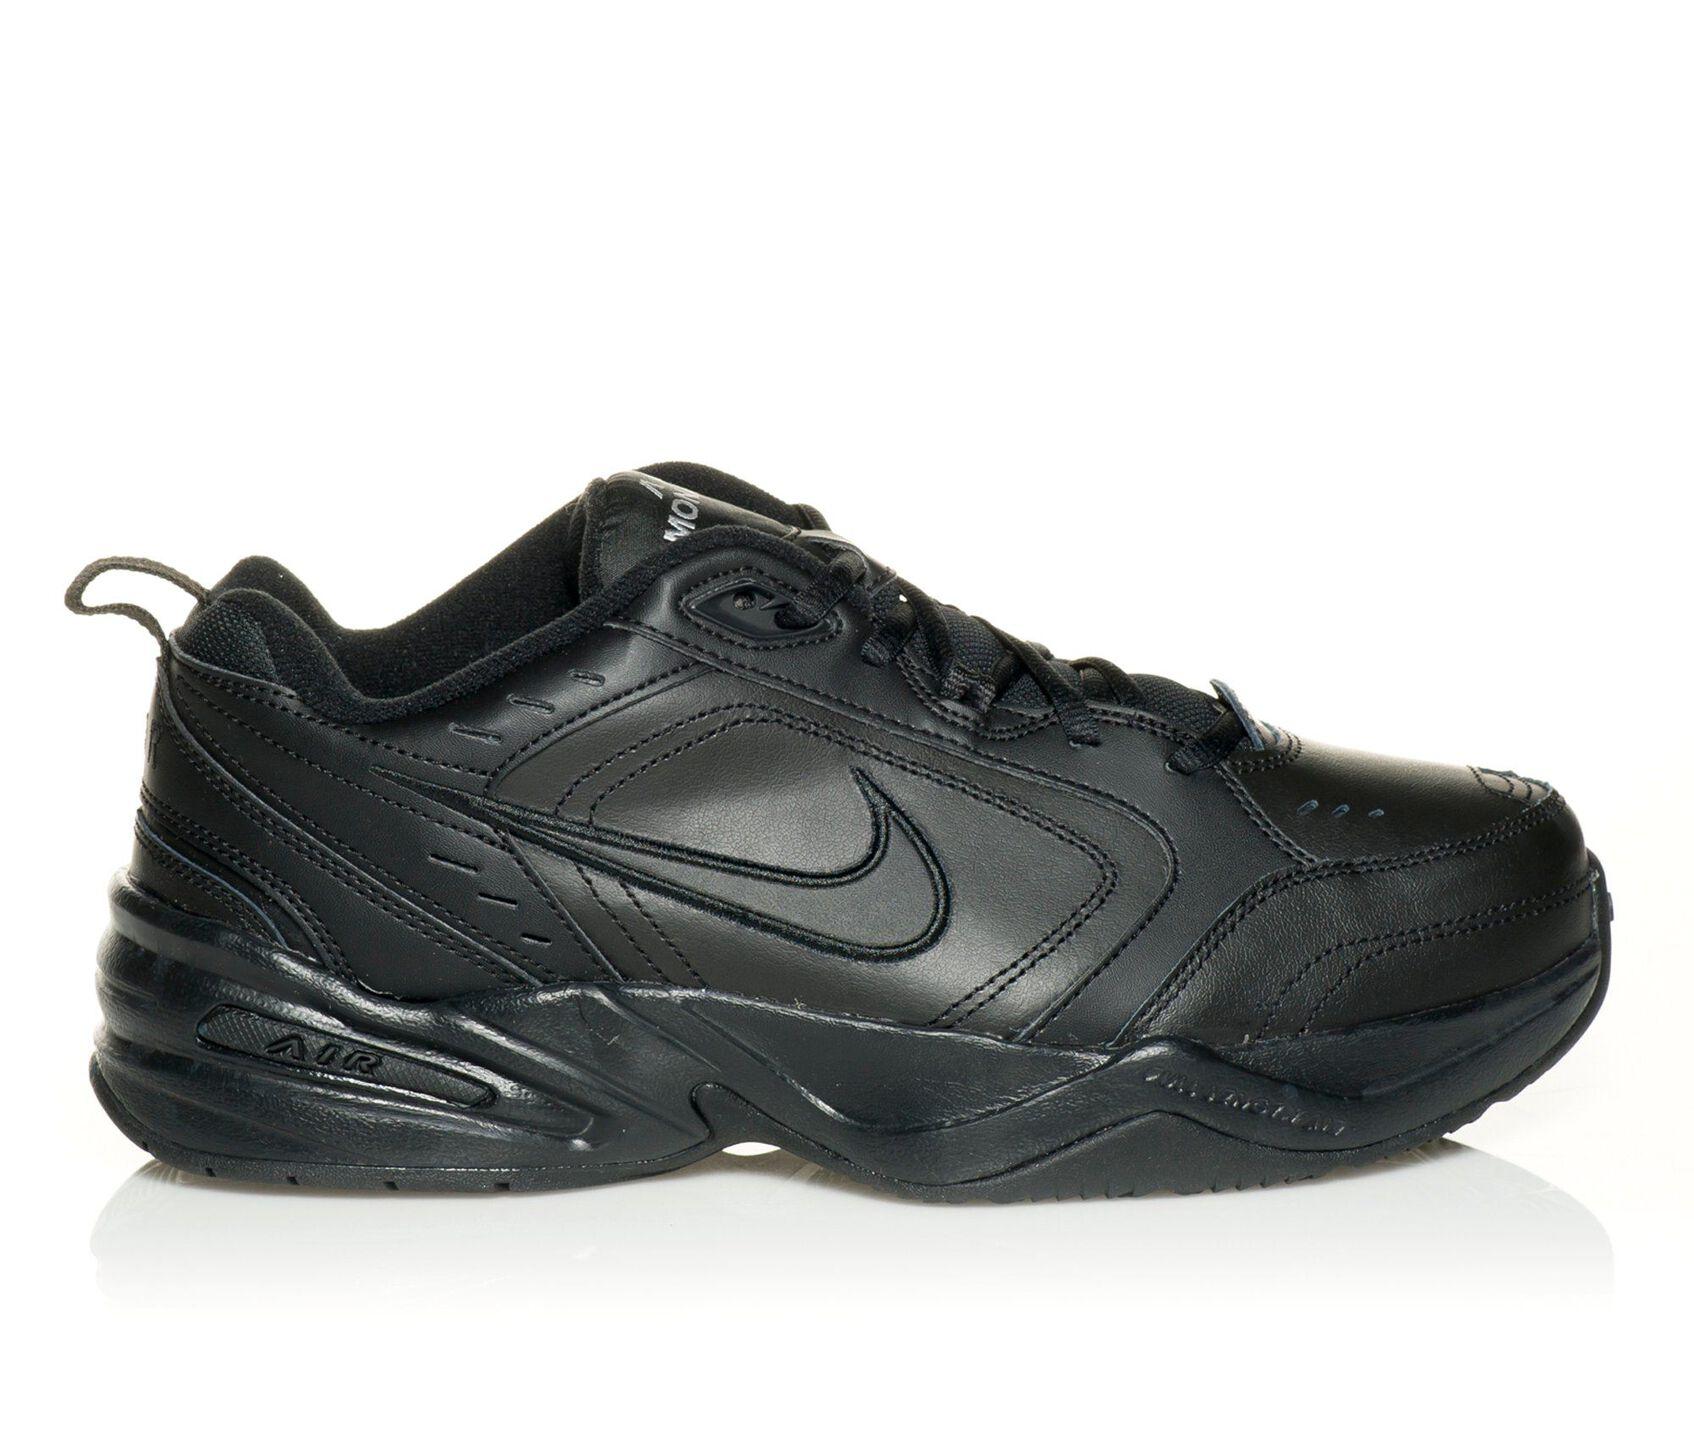 Lleno cigarro diagonal  Men's Nike Air Monarch IV Training Shoes   Shoe Carnival